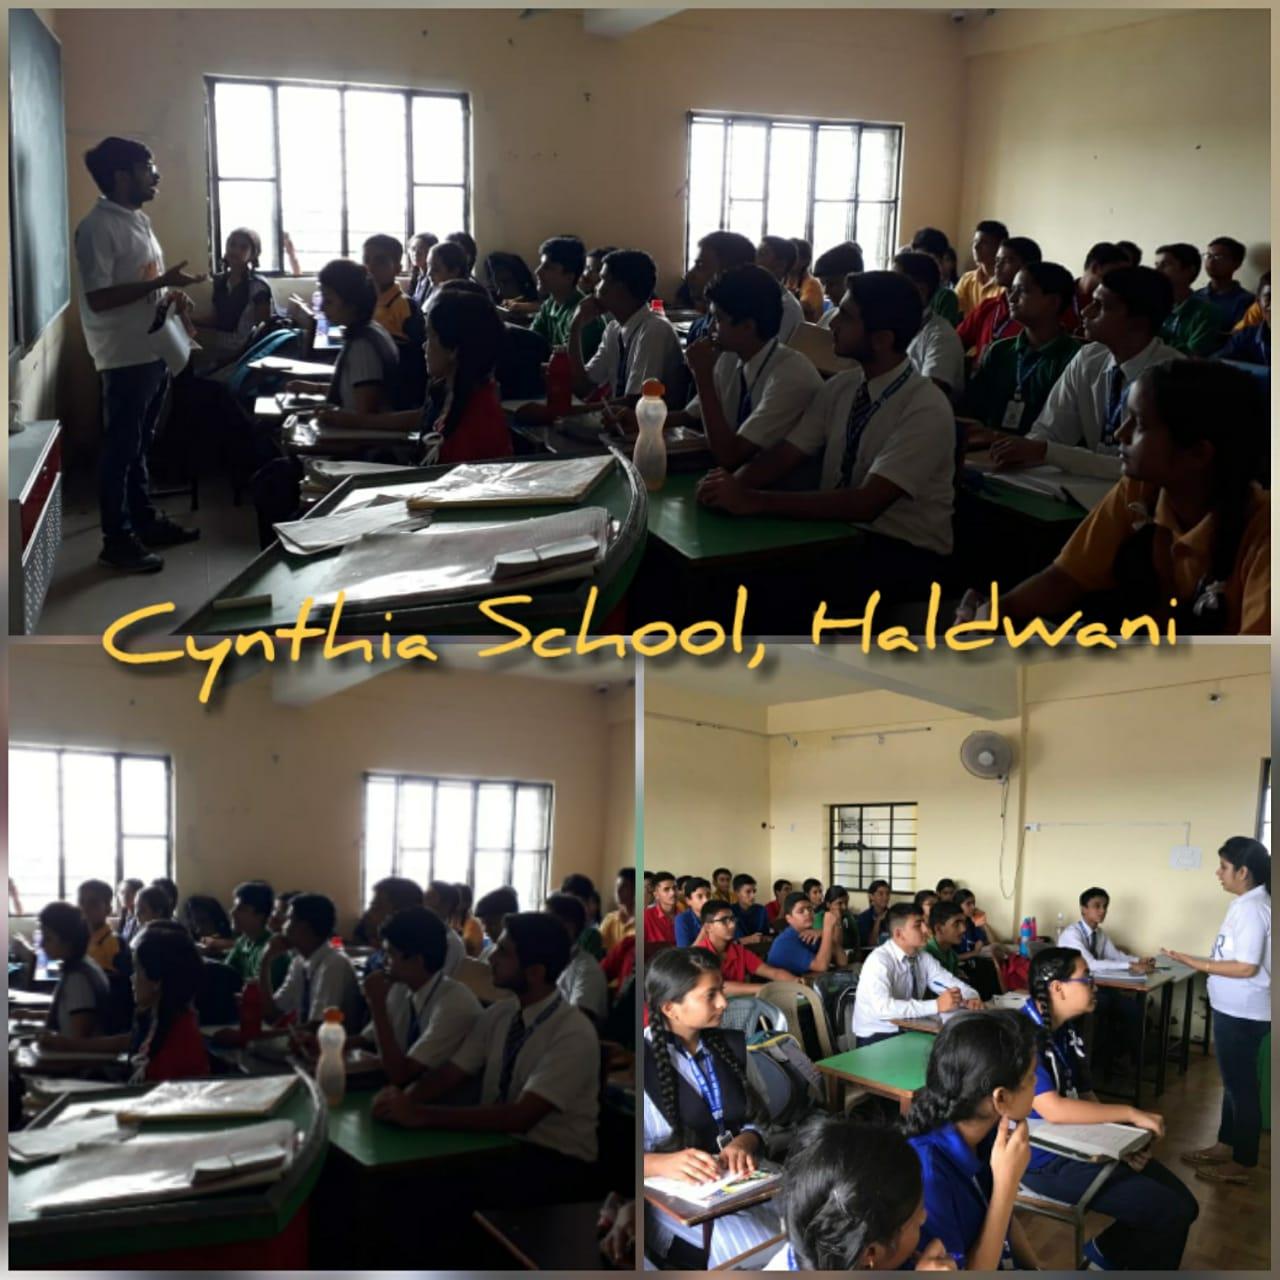 Cynthia School Haldwani.jpeg